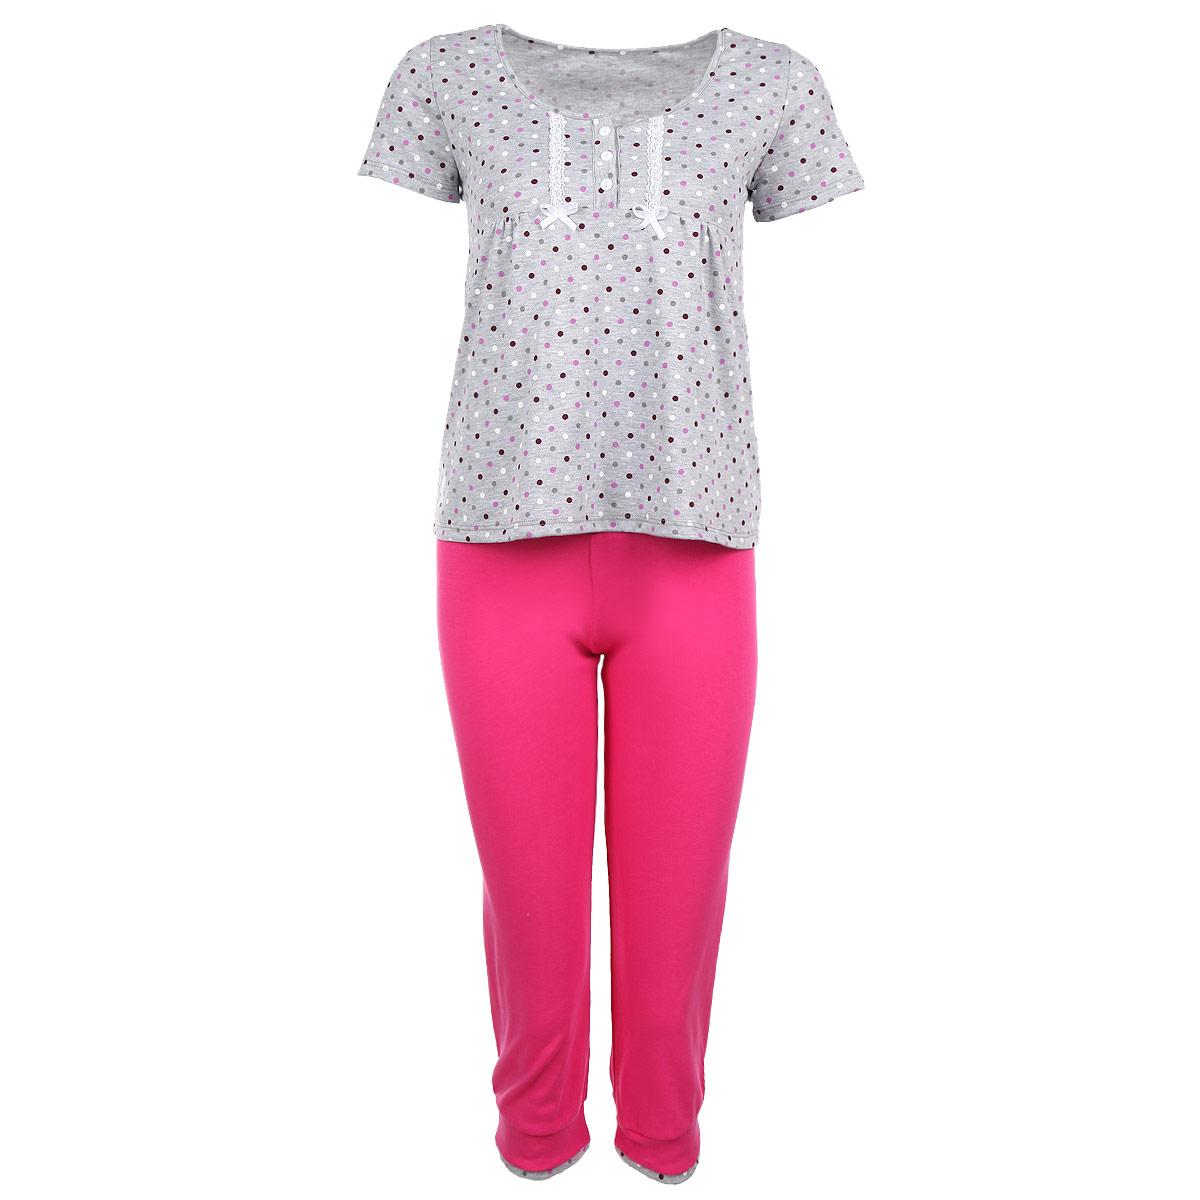 Milana Style Комплект женский: футболка, бриджи. 29